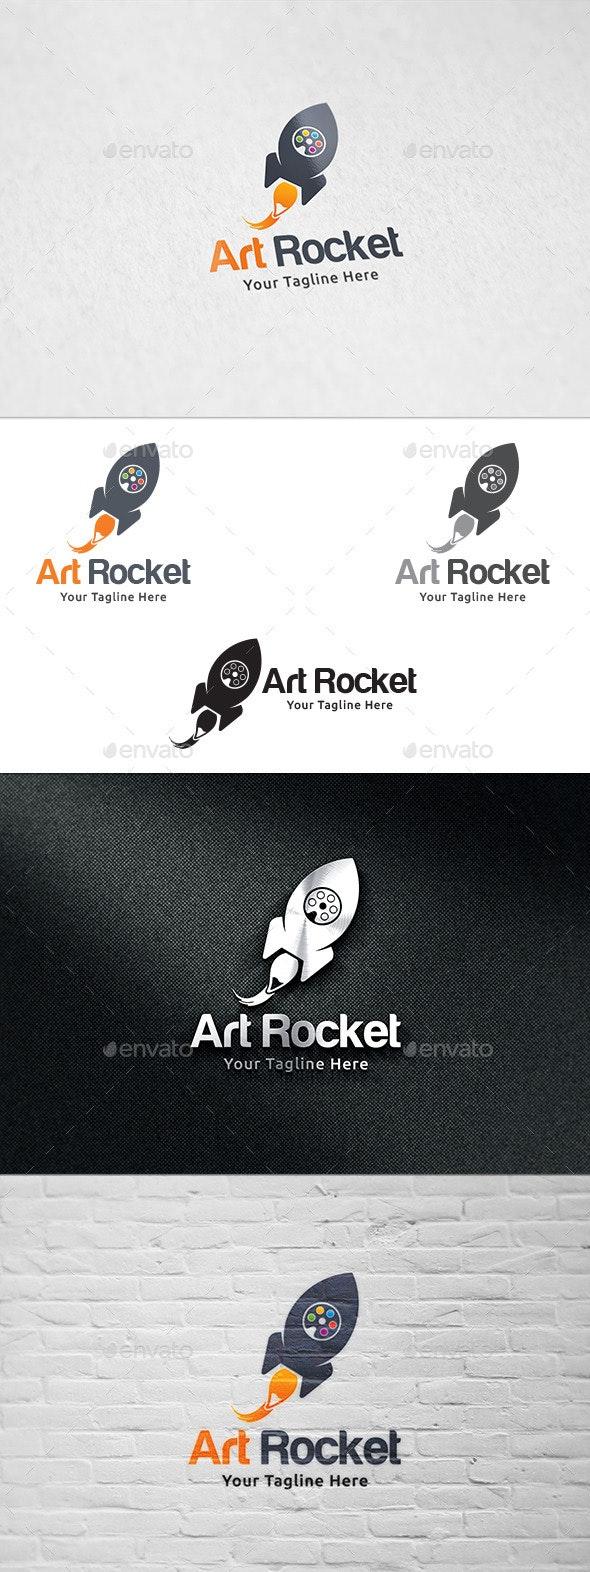 Art Rocket - Logo Design - Objects Logo Templates